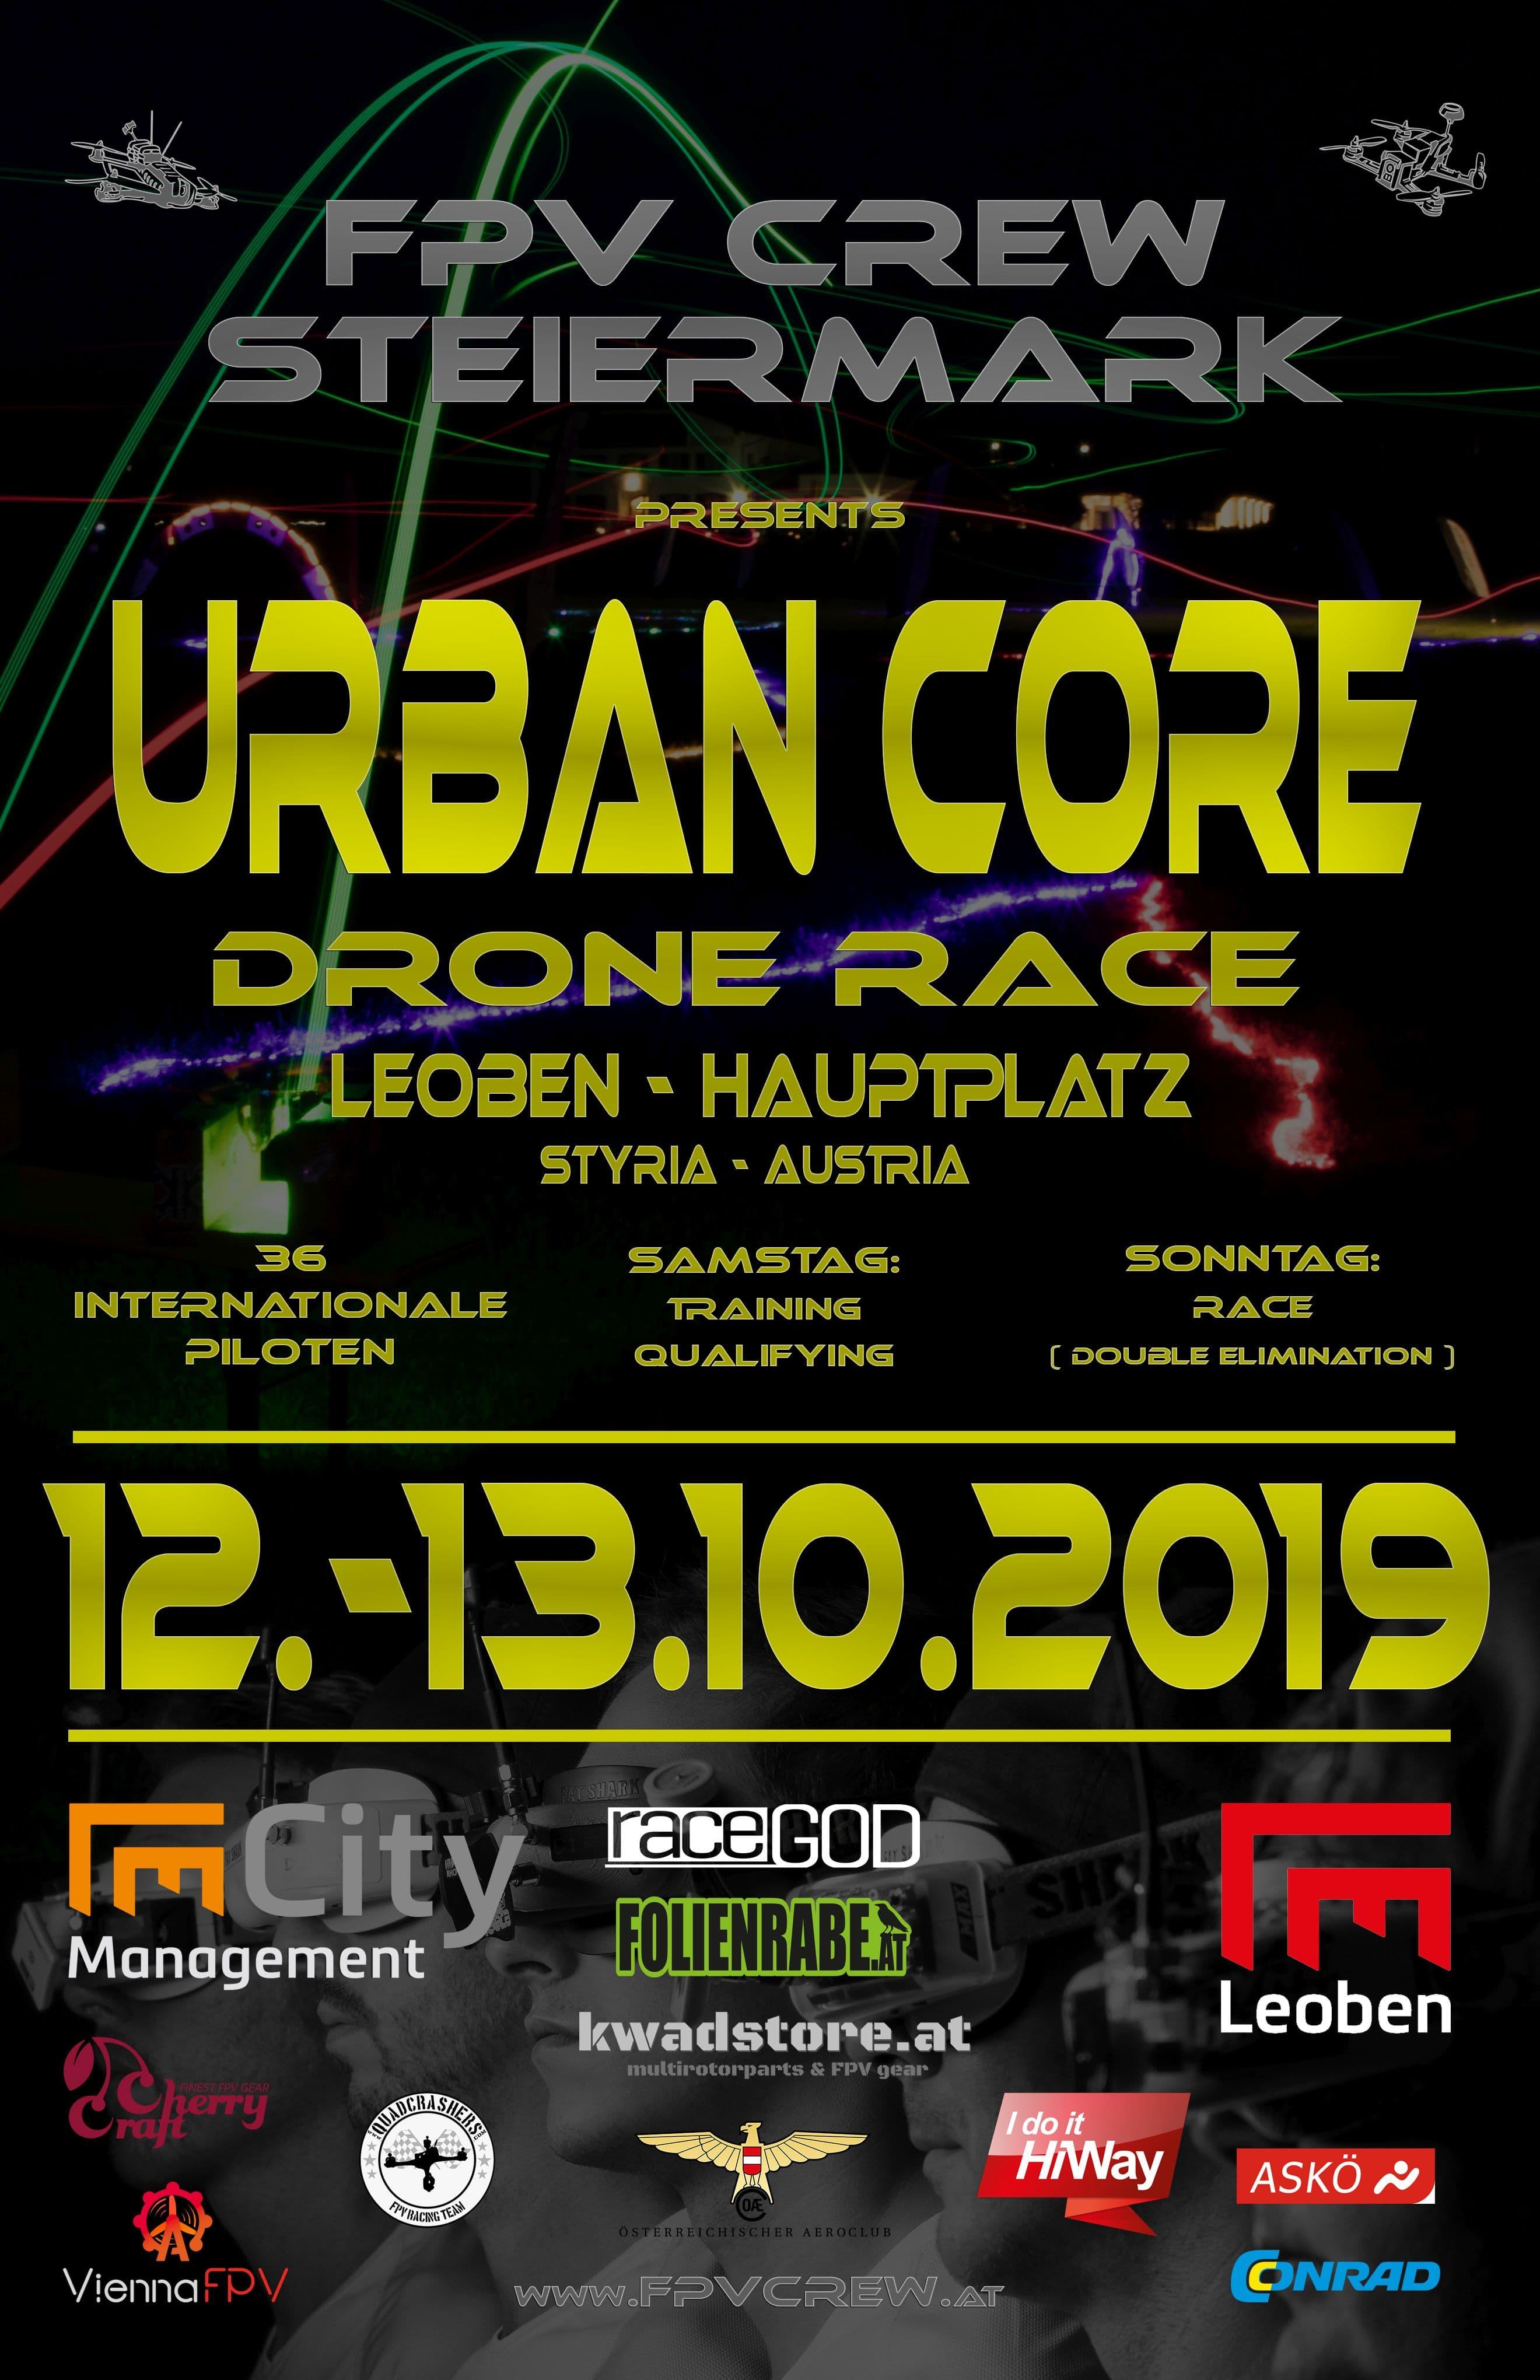 URBAN CORE Drone Race Leoben 2019